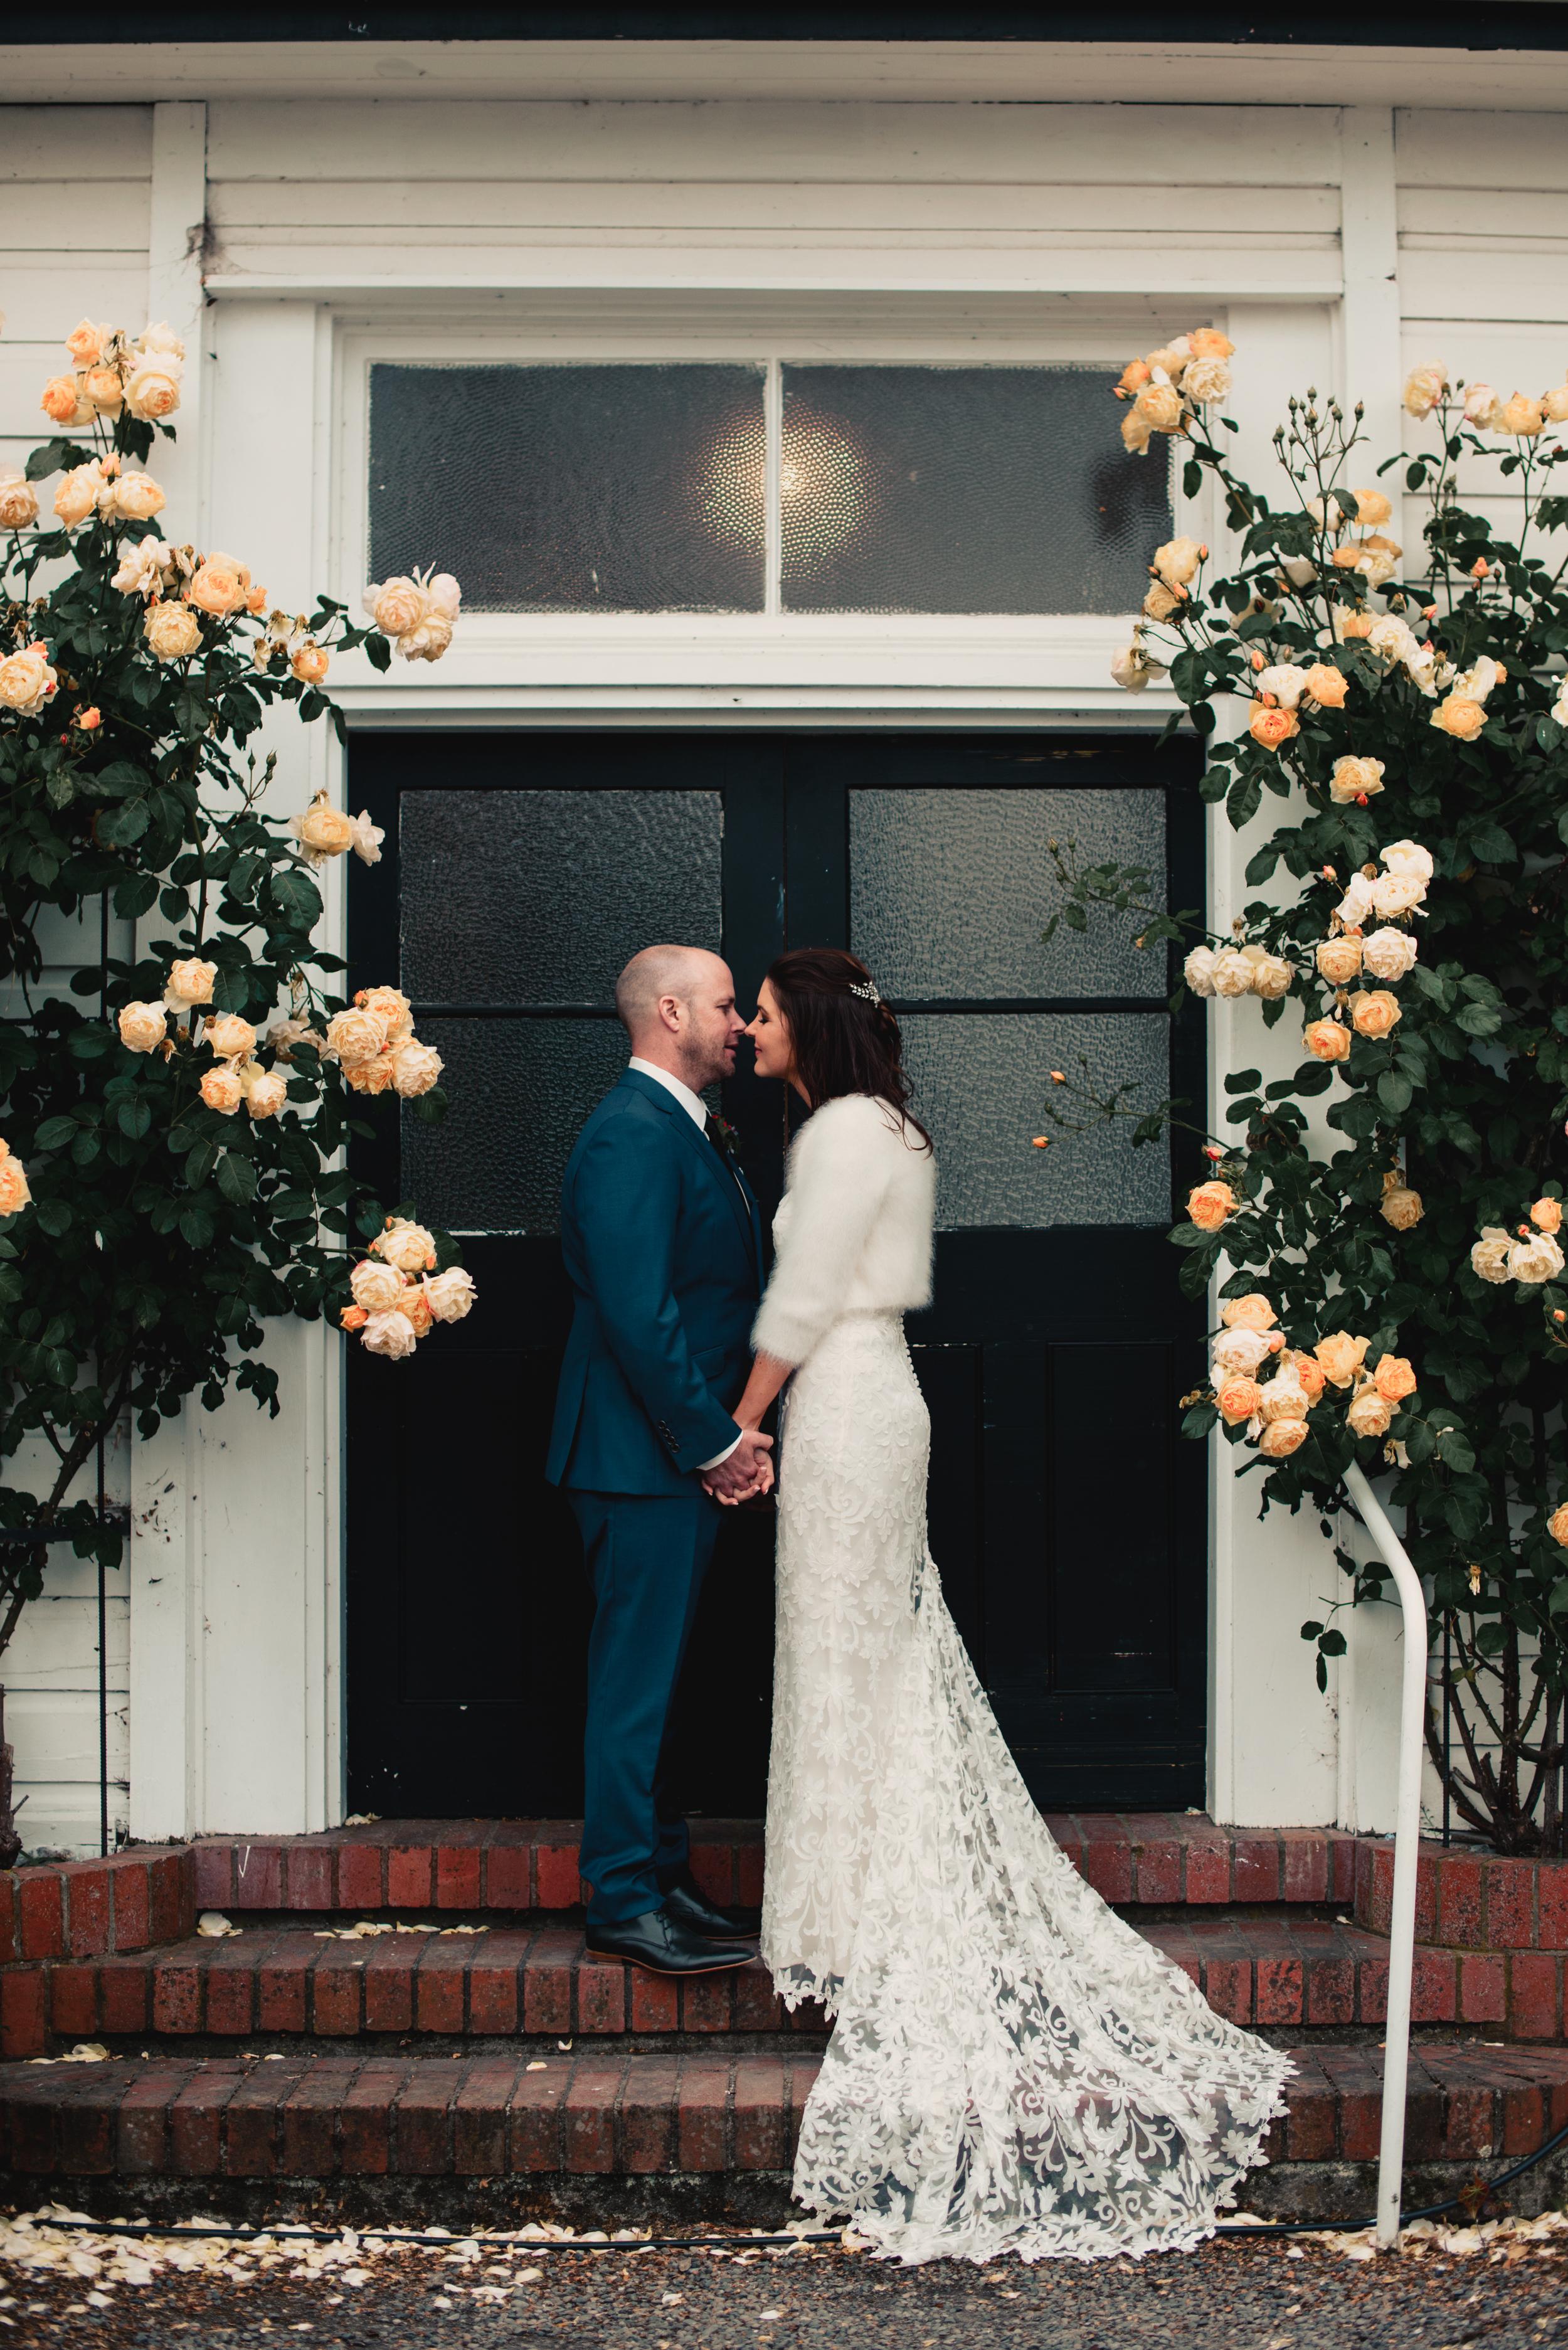 Lovelenscapes Photography • New Zealand Wedding Photographer • Wellington Wedding Photographer • Brisbane Wedding Photographer • Anna Campbell • Lace Wedding Gown • Anna Campbell Windsor Gown